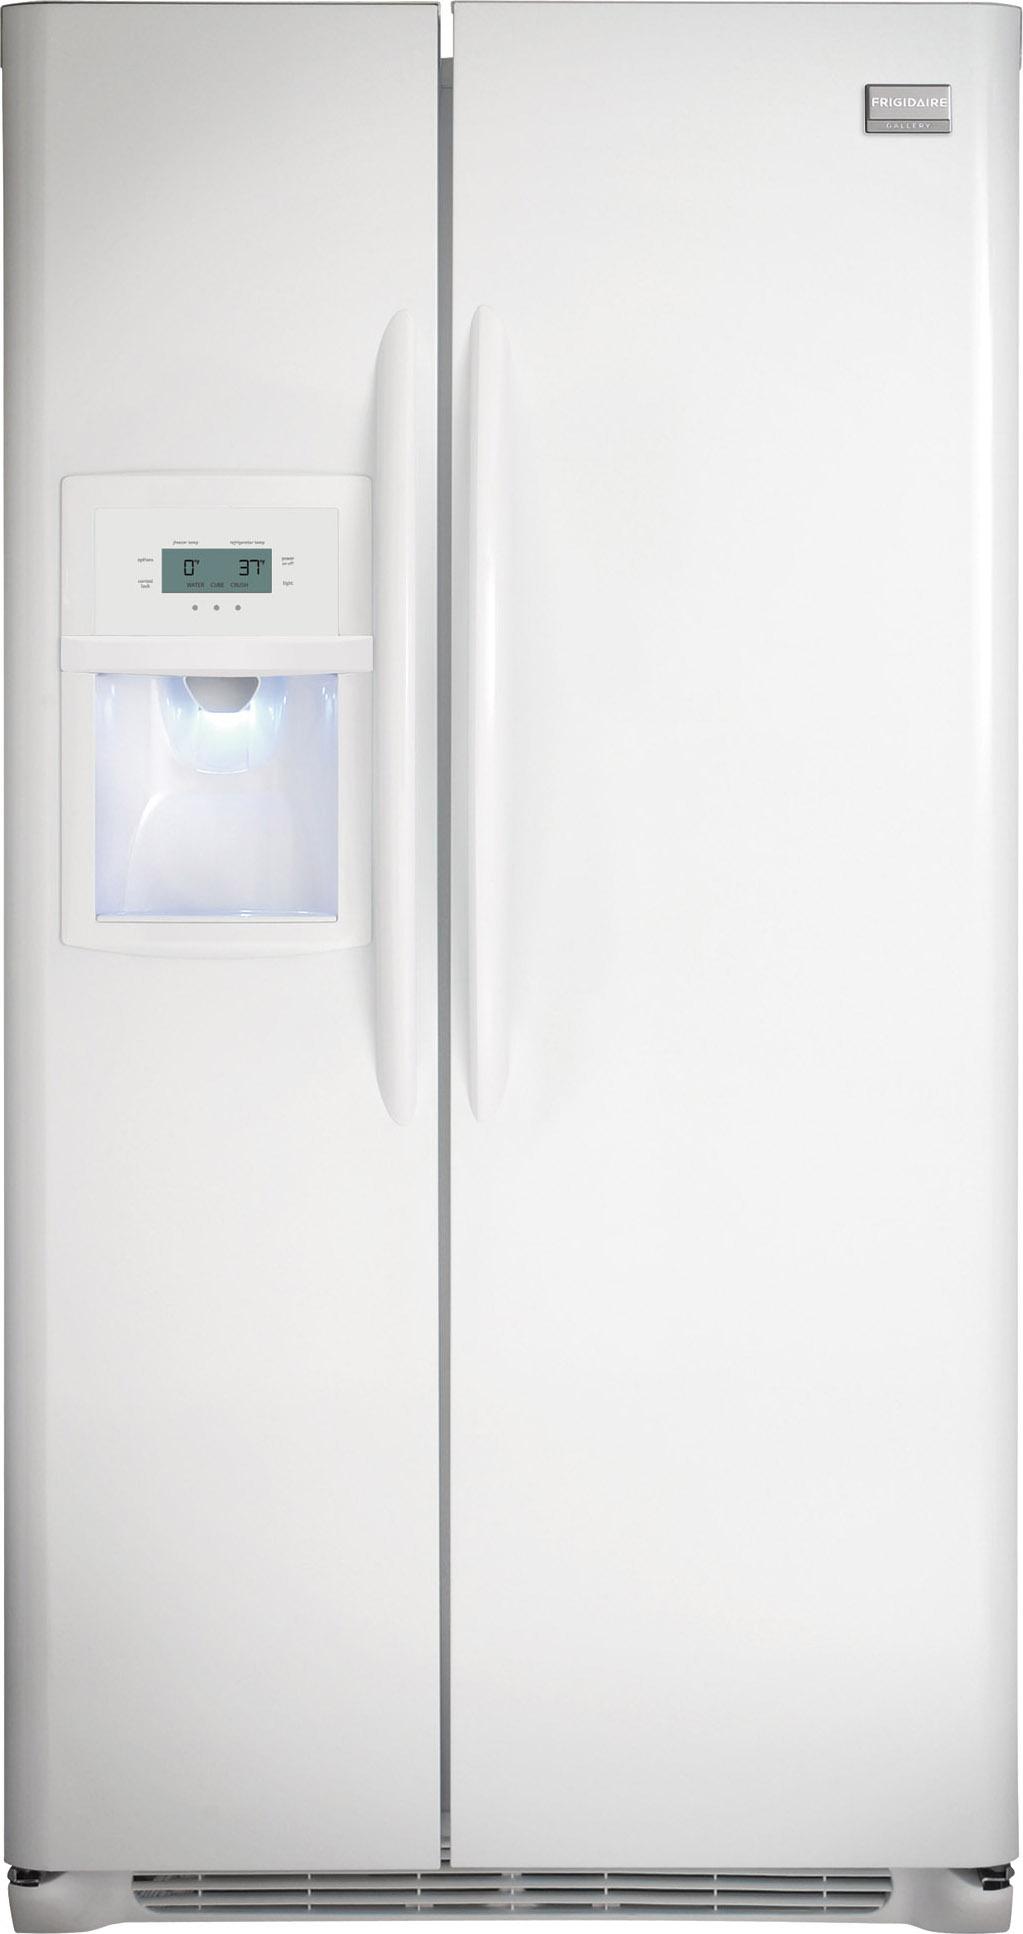 Frigidaire Refrigerator Model FGHC2335LP2 Parts